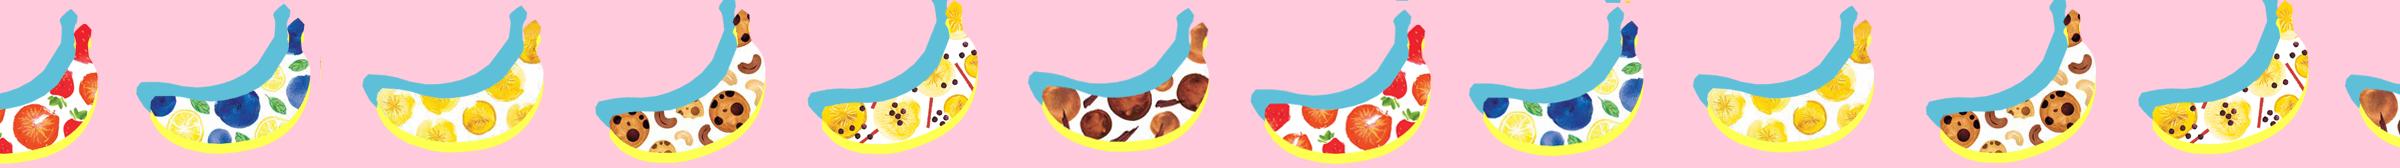 BananaBanner.png